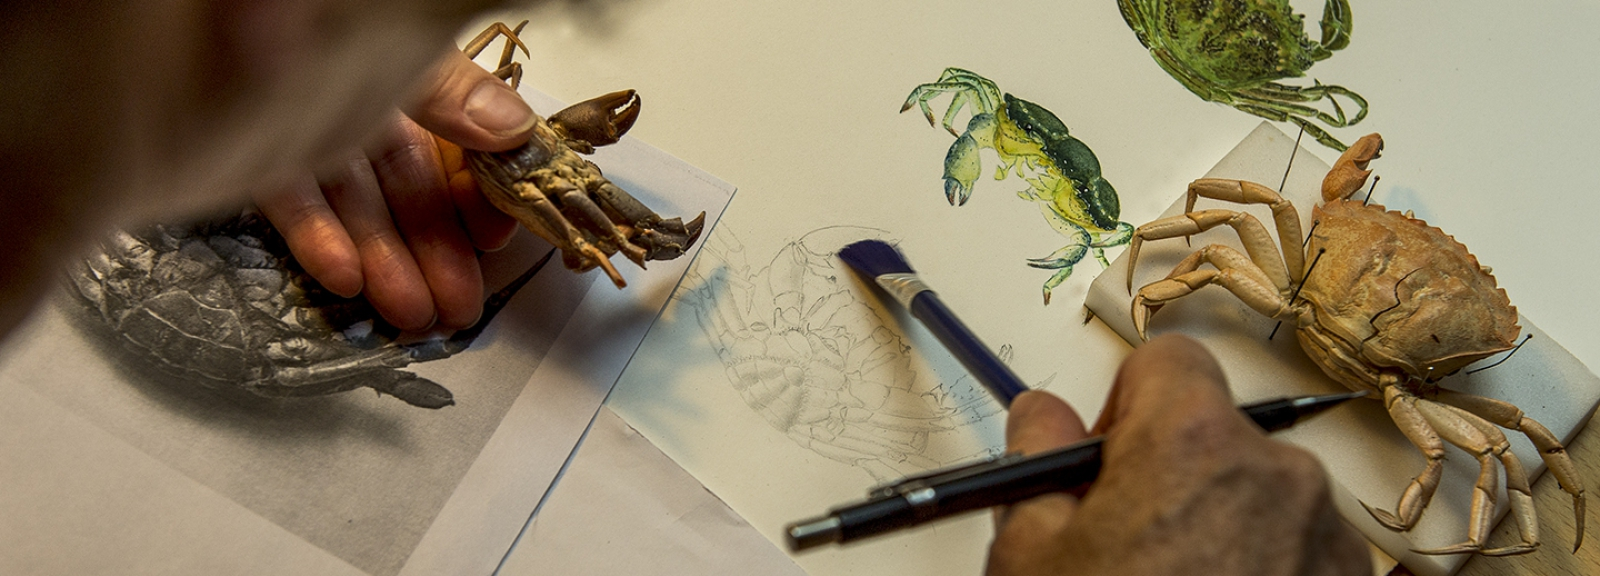 Les dessinatrices © MNHN - Bruno Jay